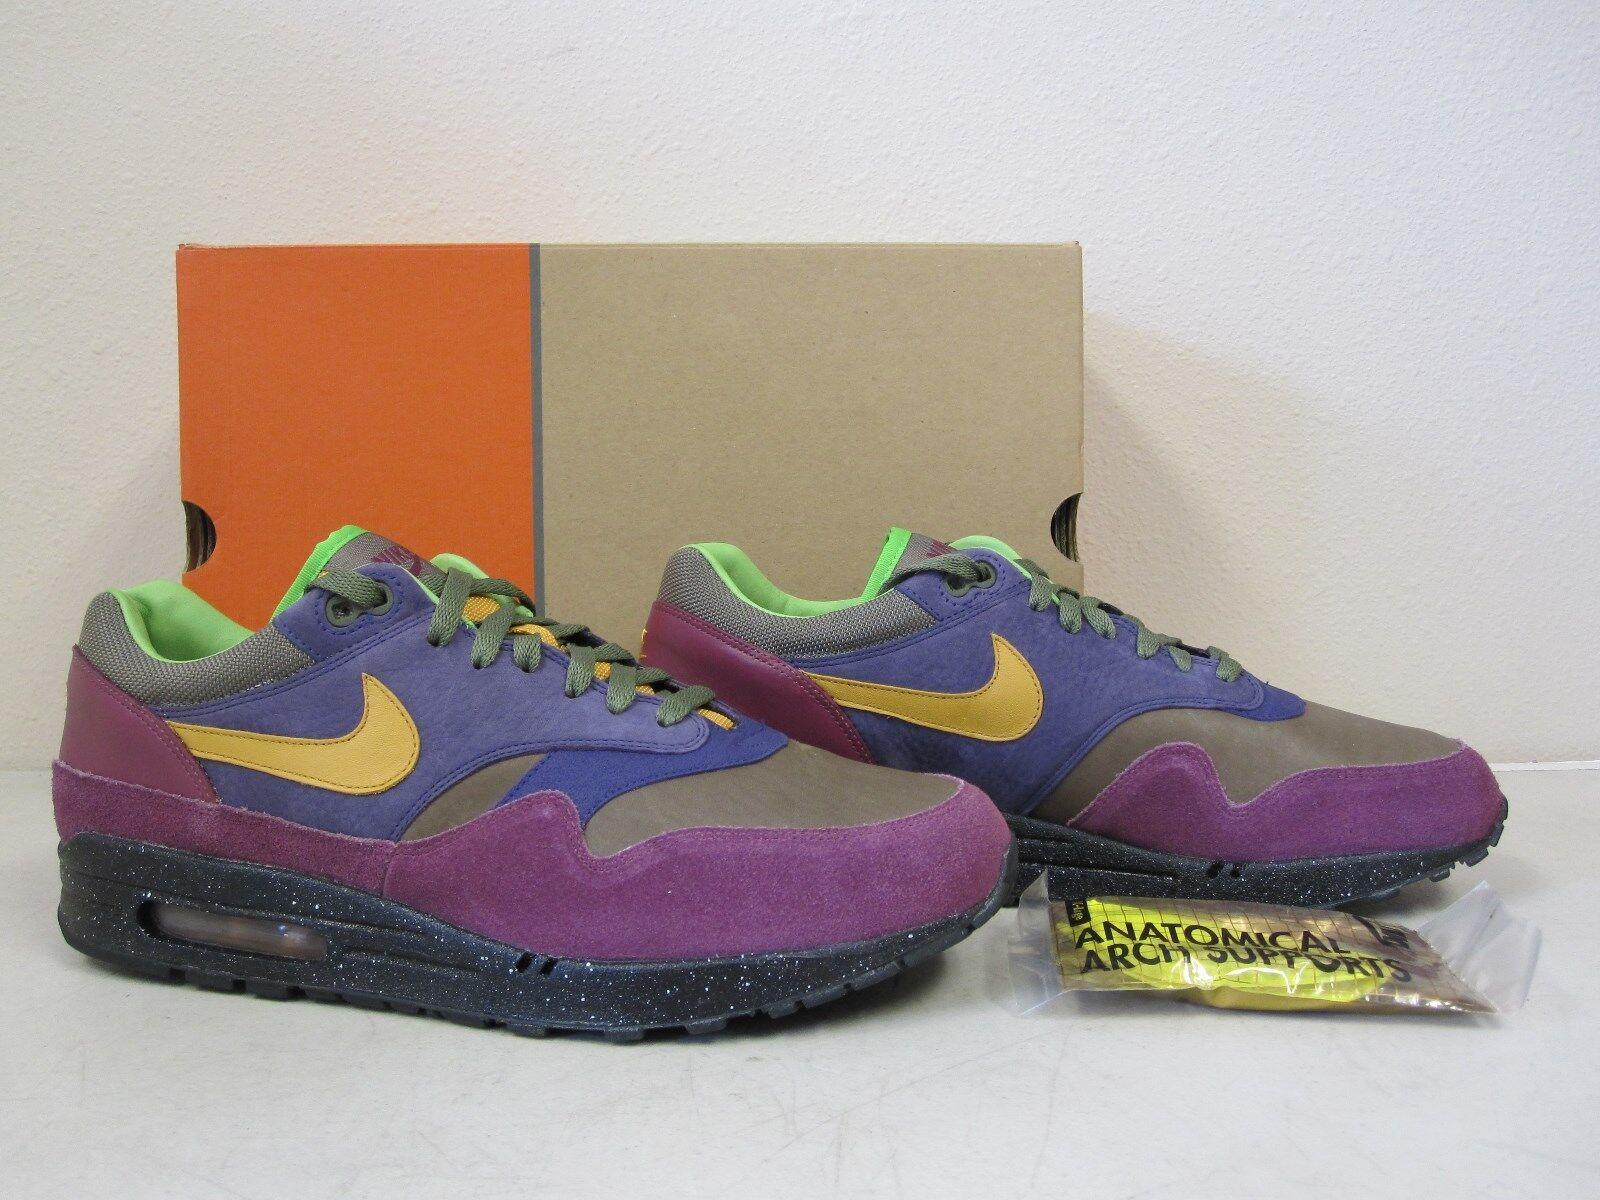 Nike 1 Upc Men's Premium 884802878155 Shoes Max Air 5cq4ARS3Lj